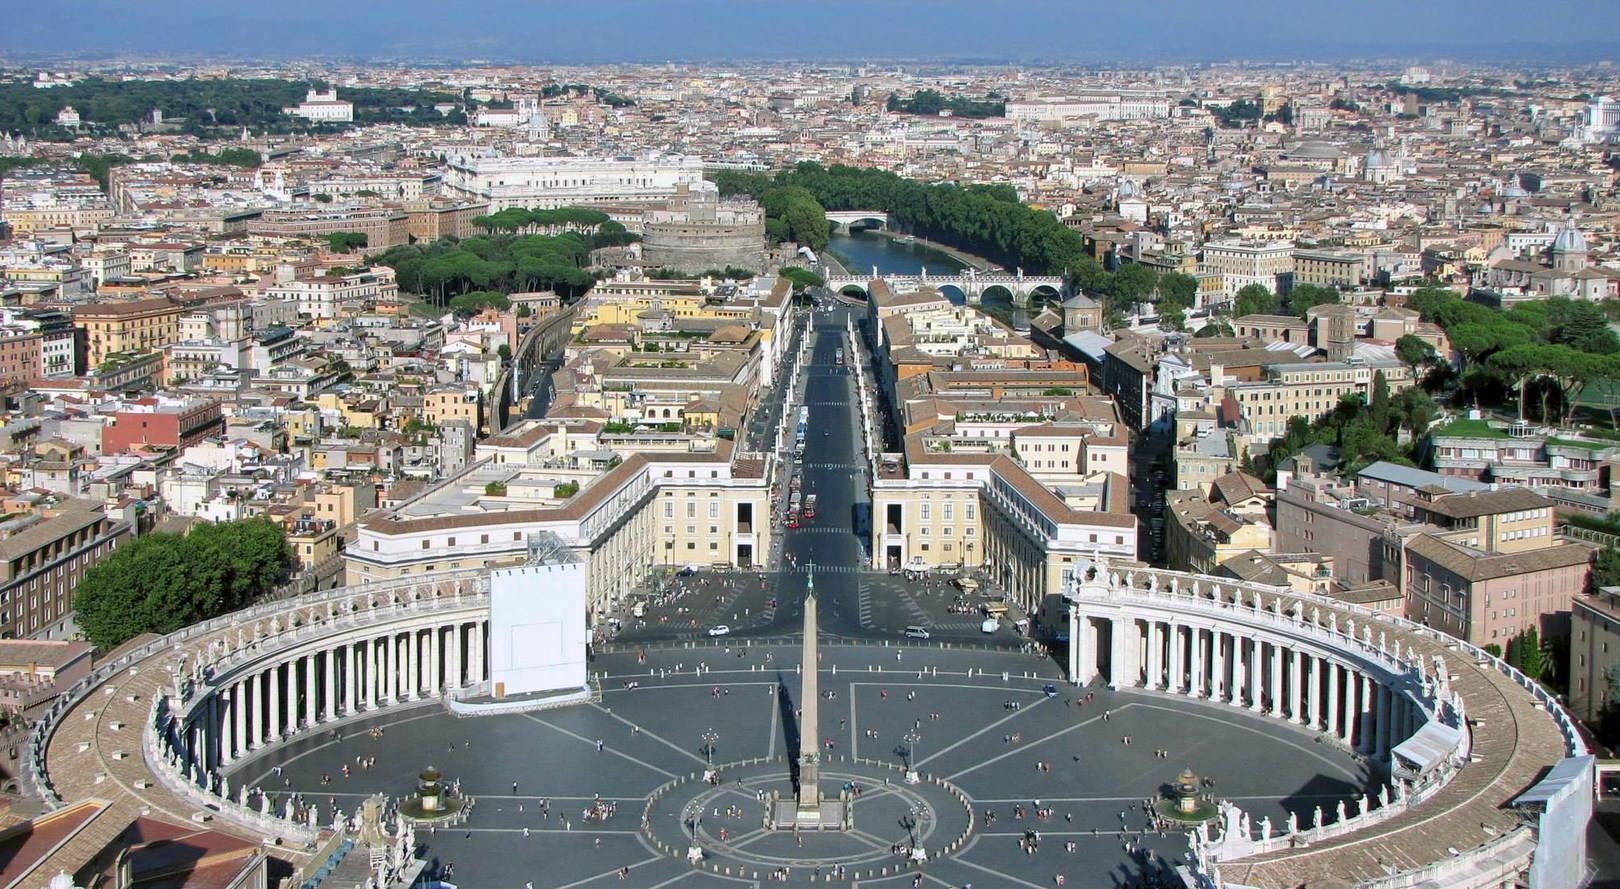 Площадь Святого Петра в Ватикане и город Рим (Италия).